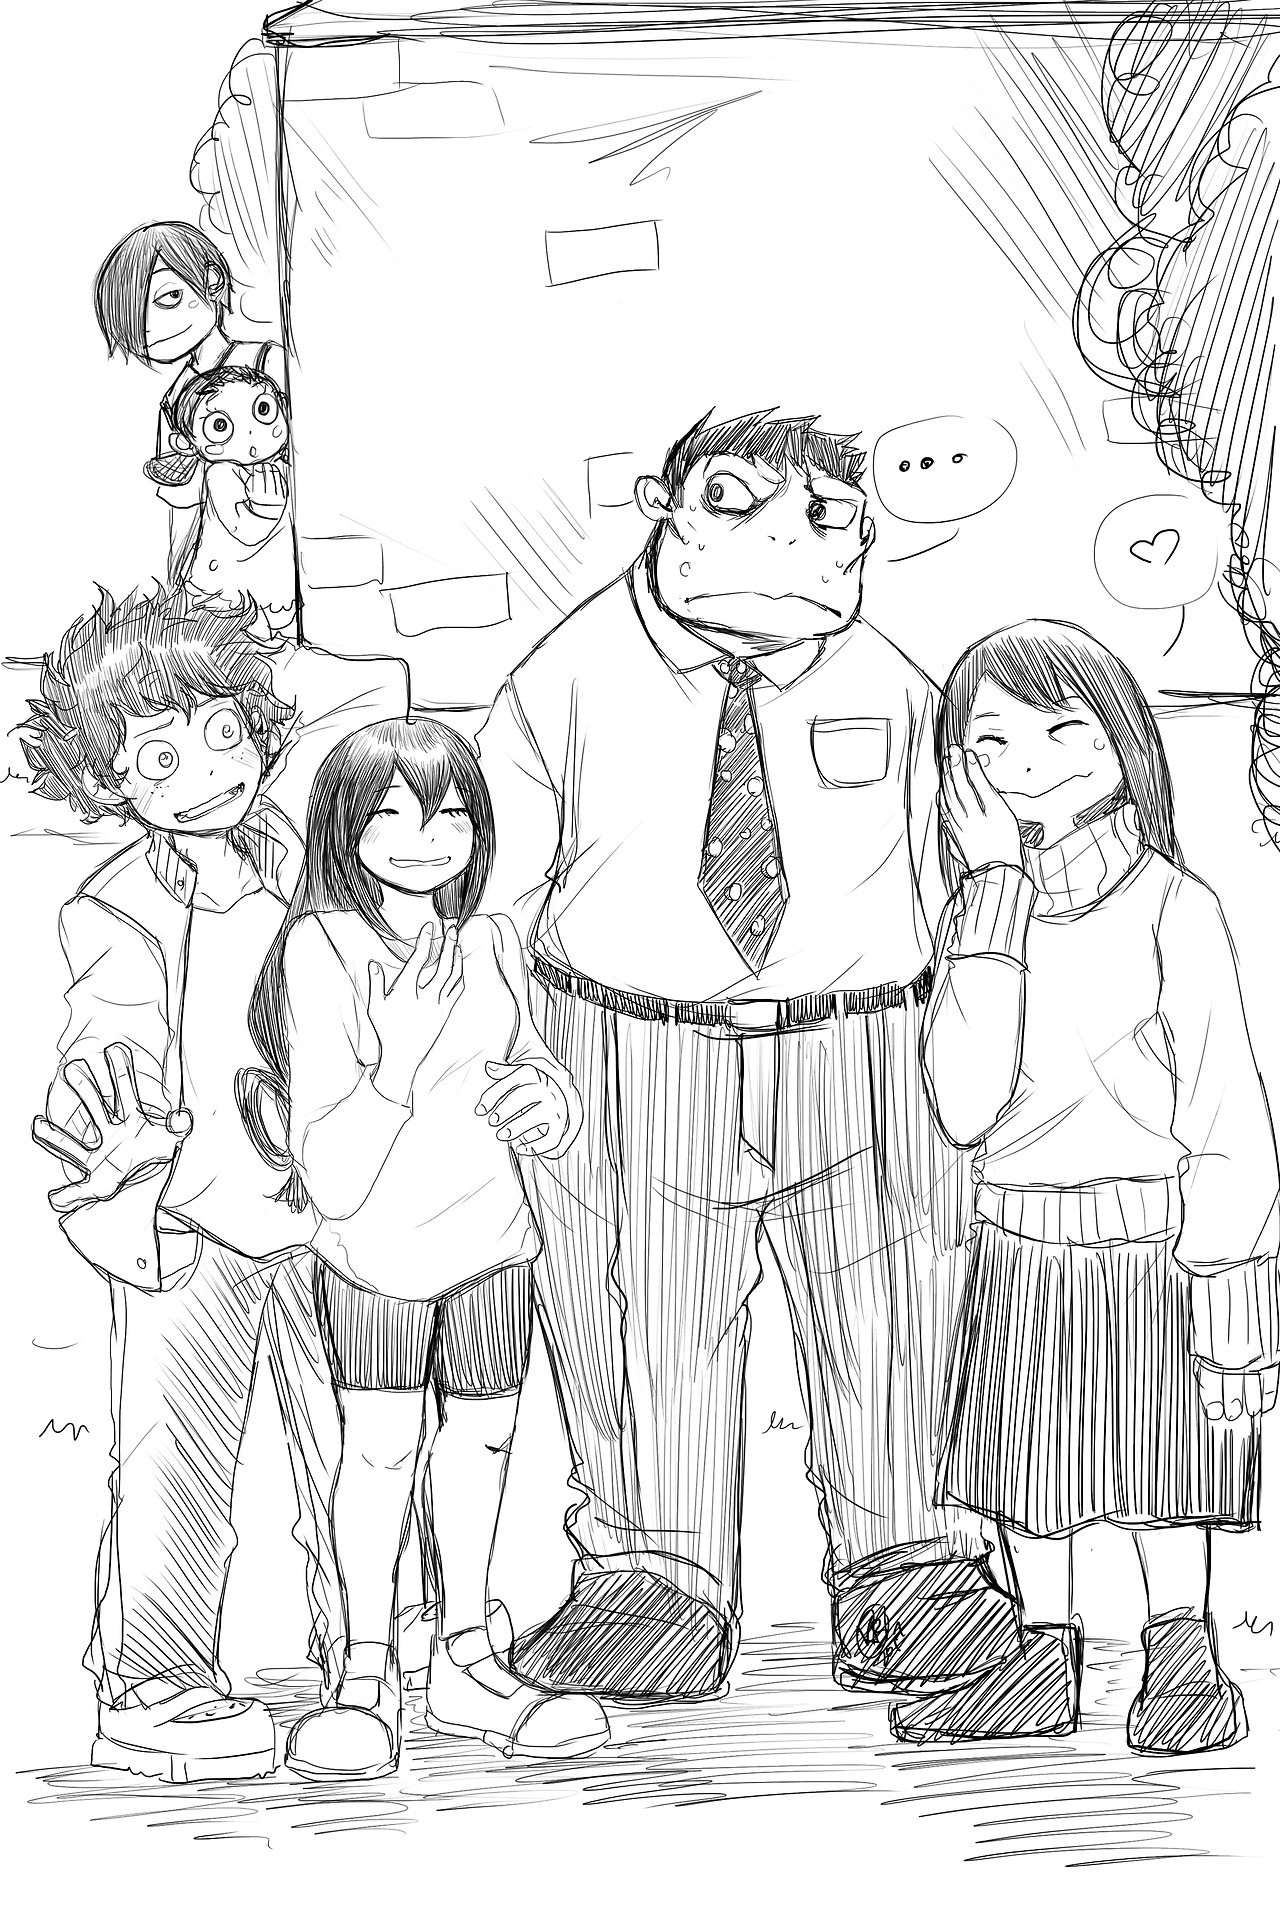 Tsuyu S Family My Hero Academia Know Your Meme